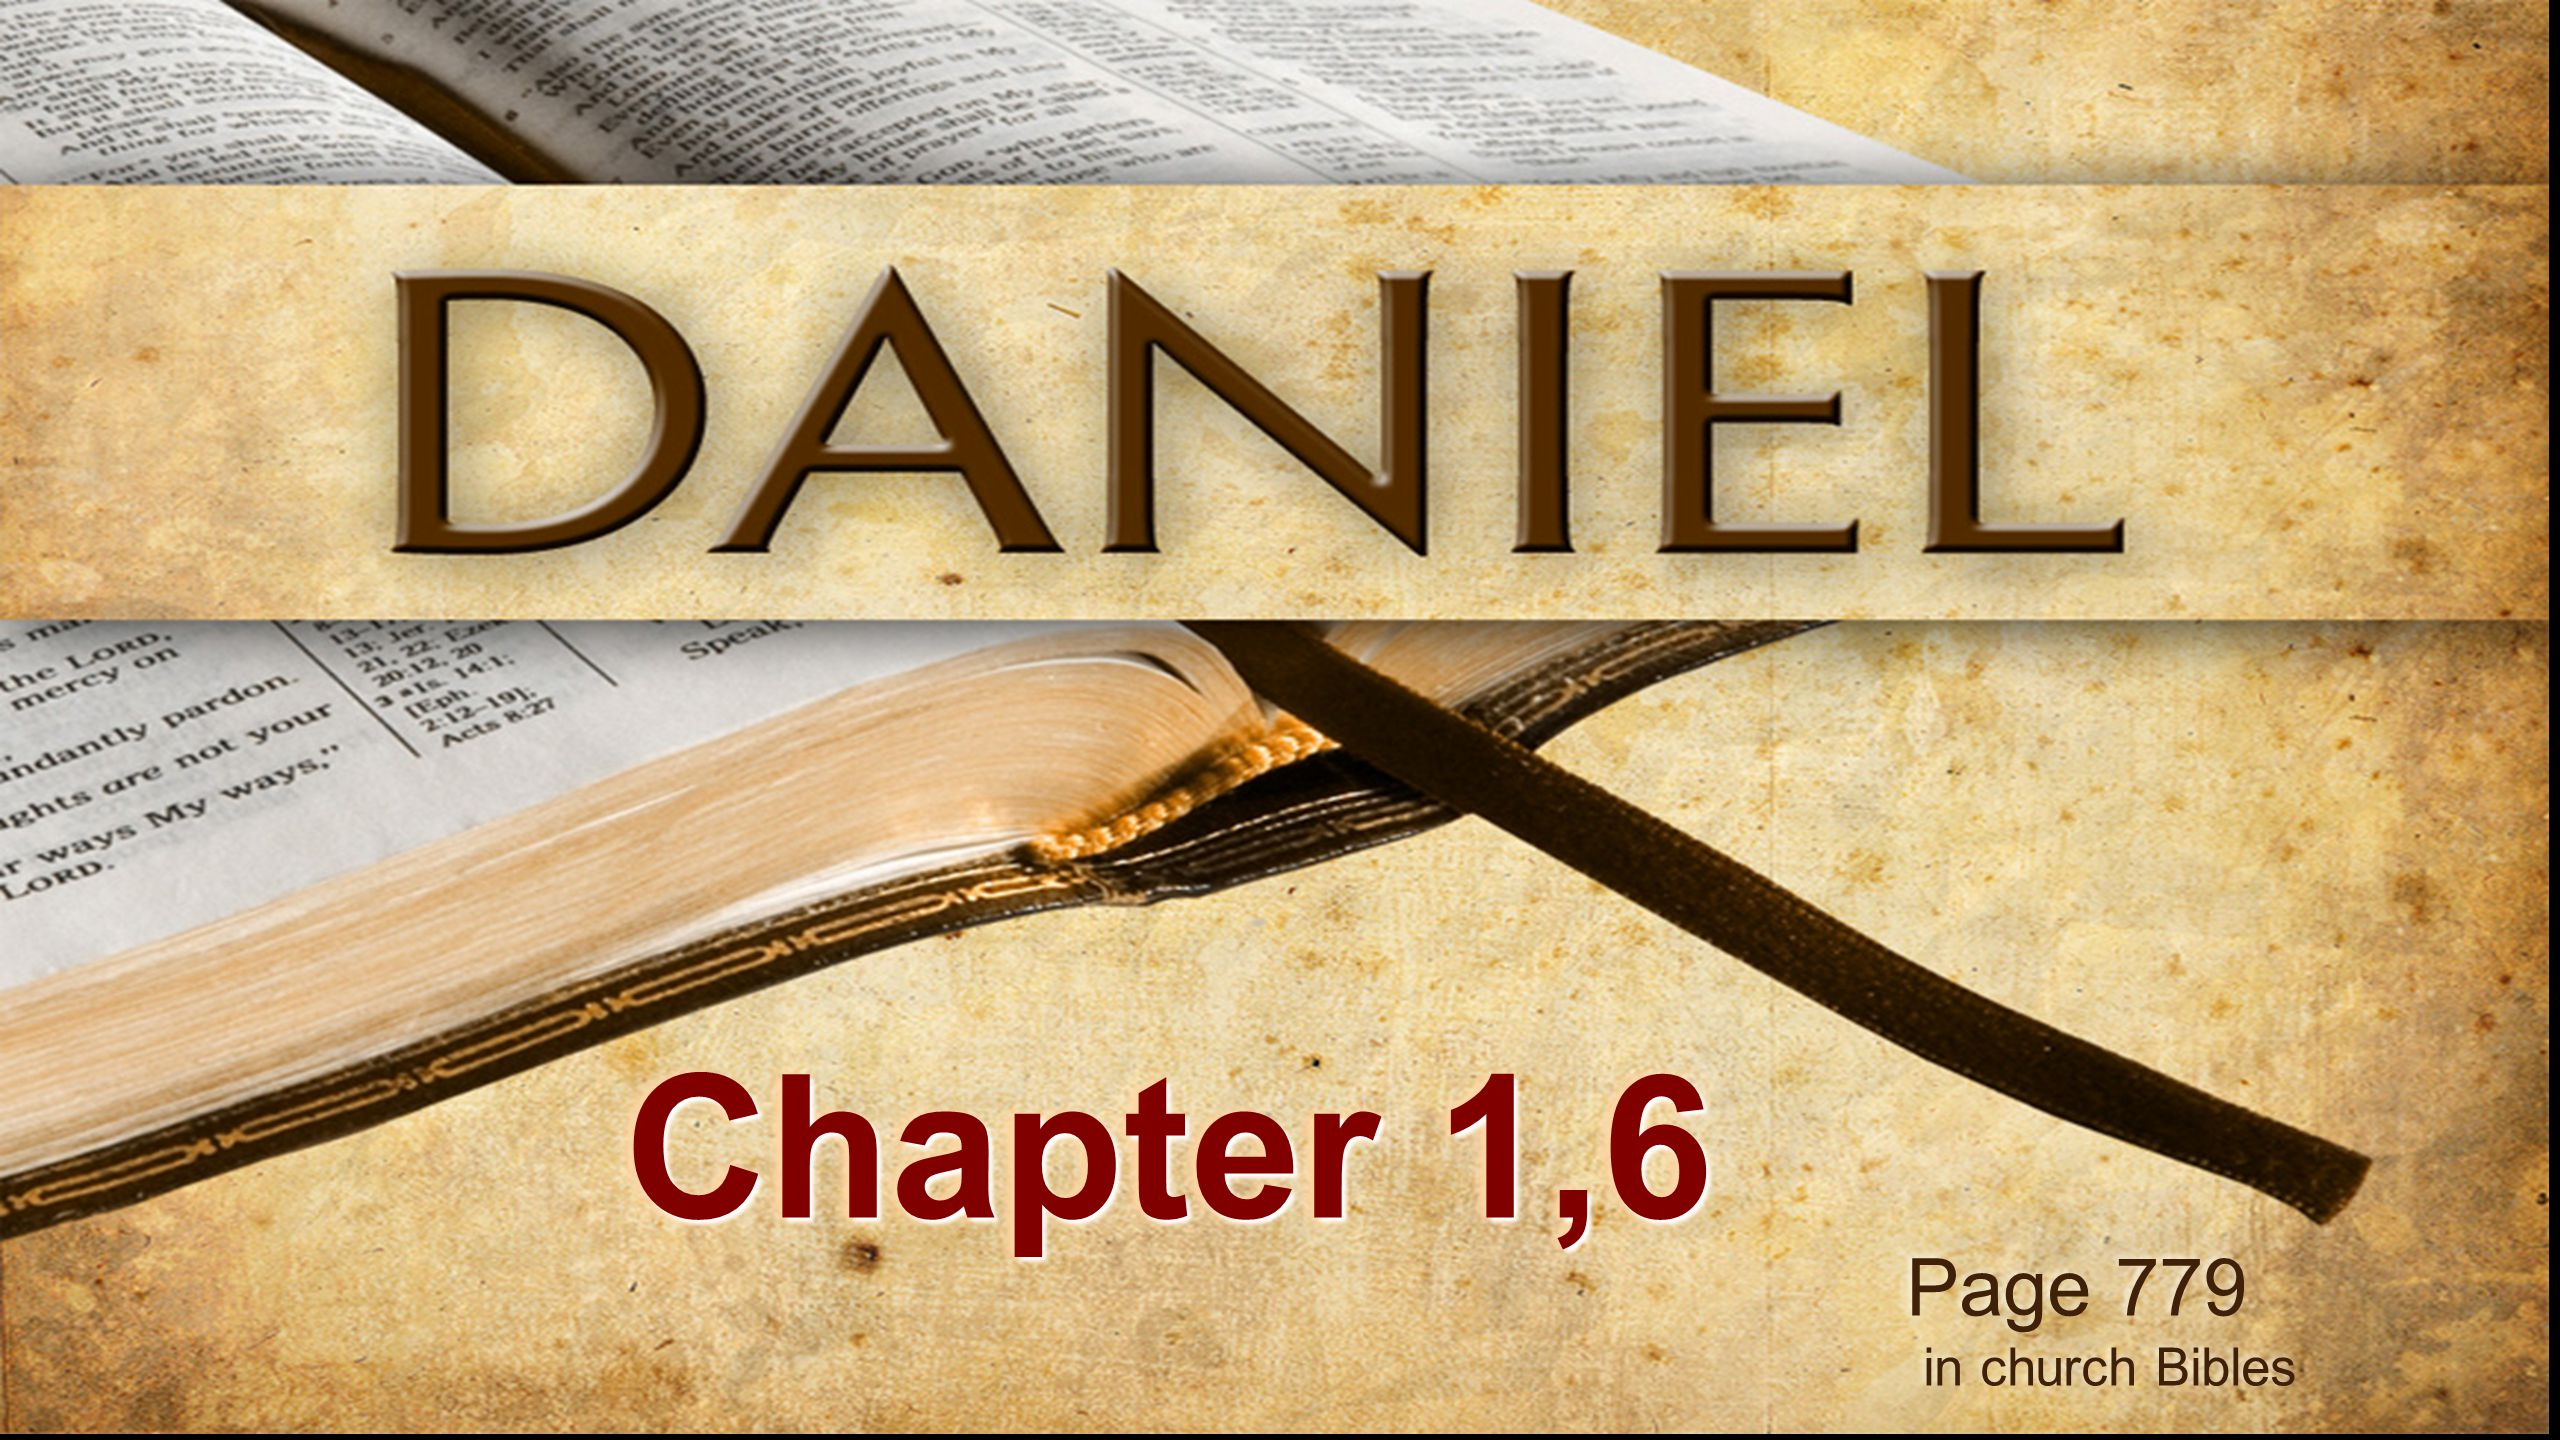 Page 779 in church Bibles Page 779 in church Bibles Chapter 1,6